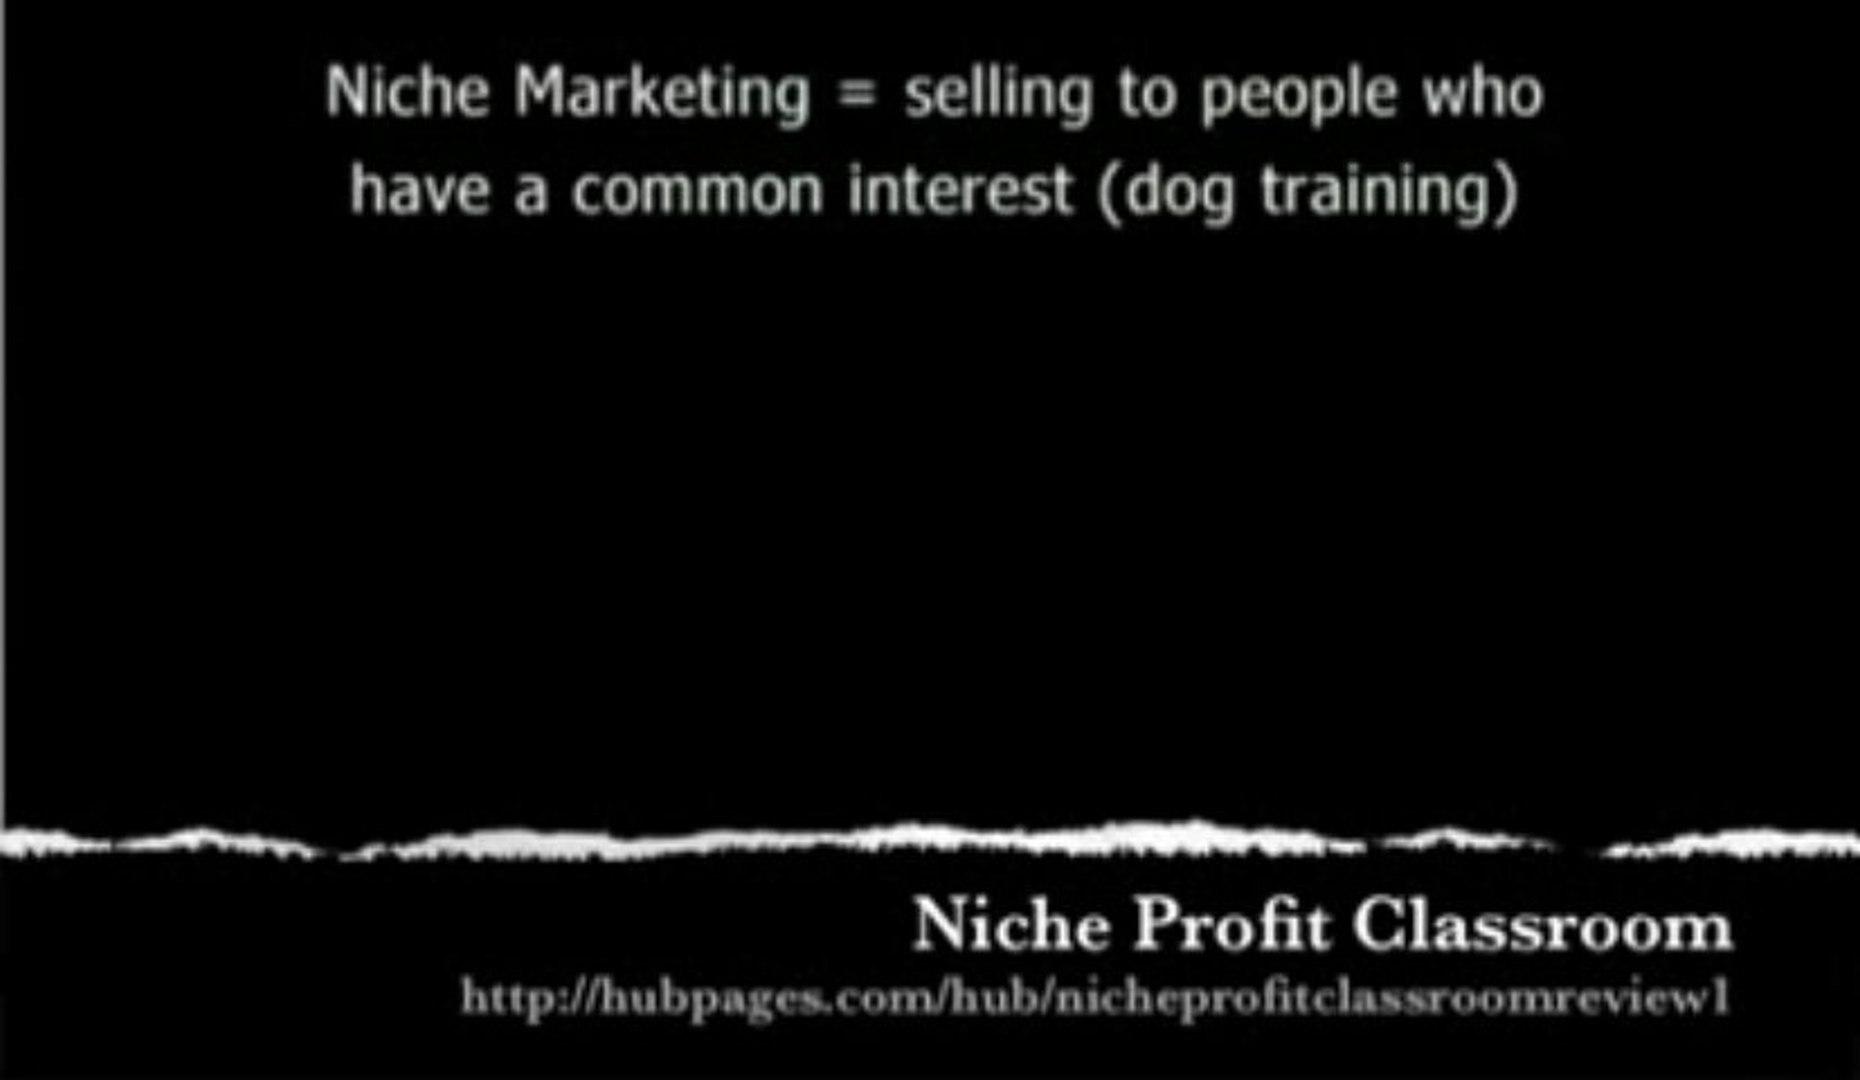 Niche Profit Classroom | Niche Profit Classroom